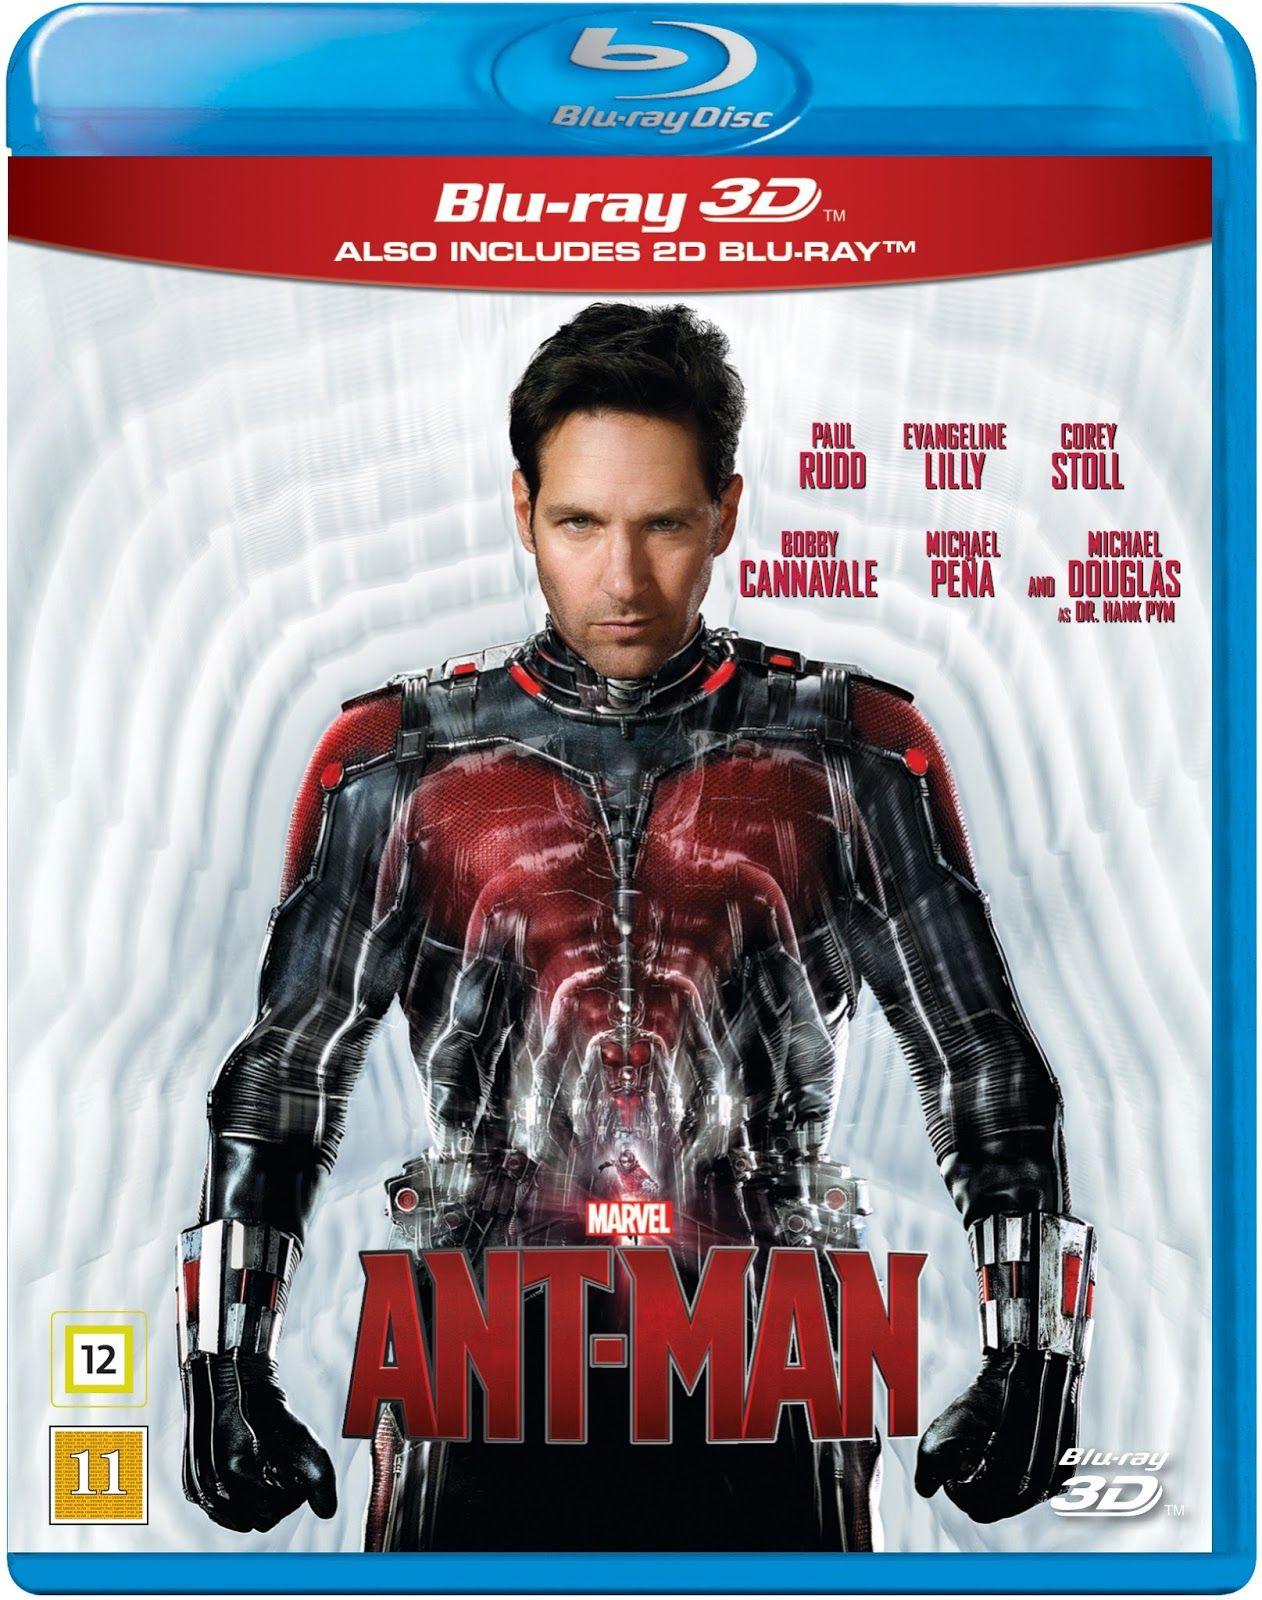 AntMan (2015) BluRay X264 1080p Dual Audio [Eng DD5.1